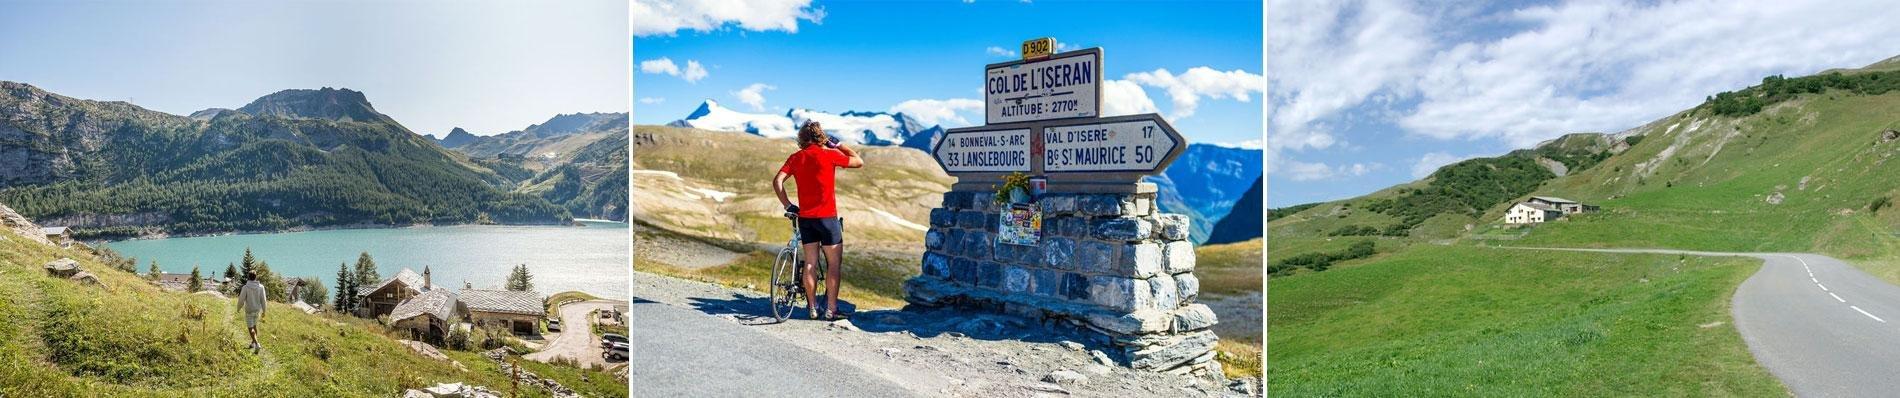 sainte foy zomervakantie bergen alpen fietsen wandelen